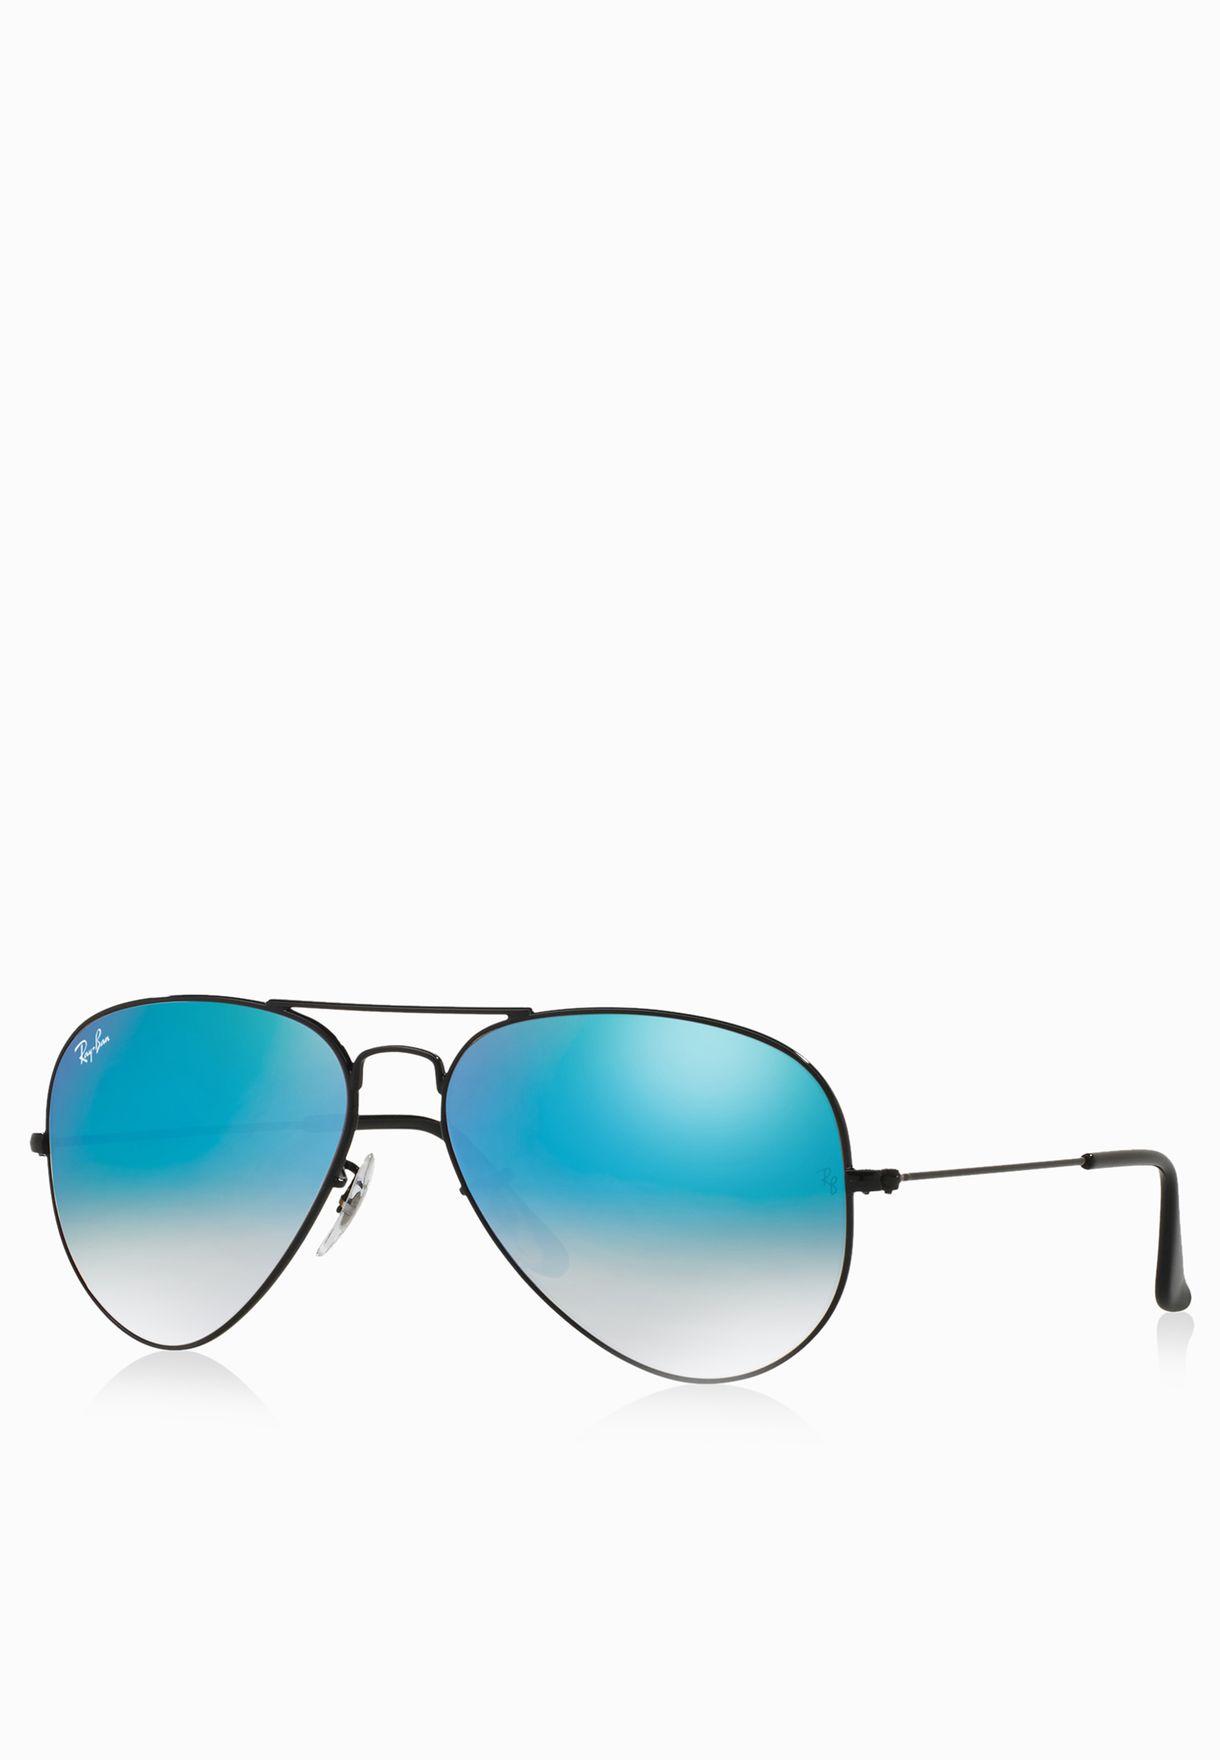 0RB3025 Aviators Sunglasses